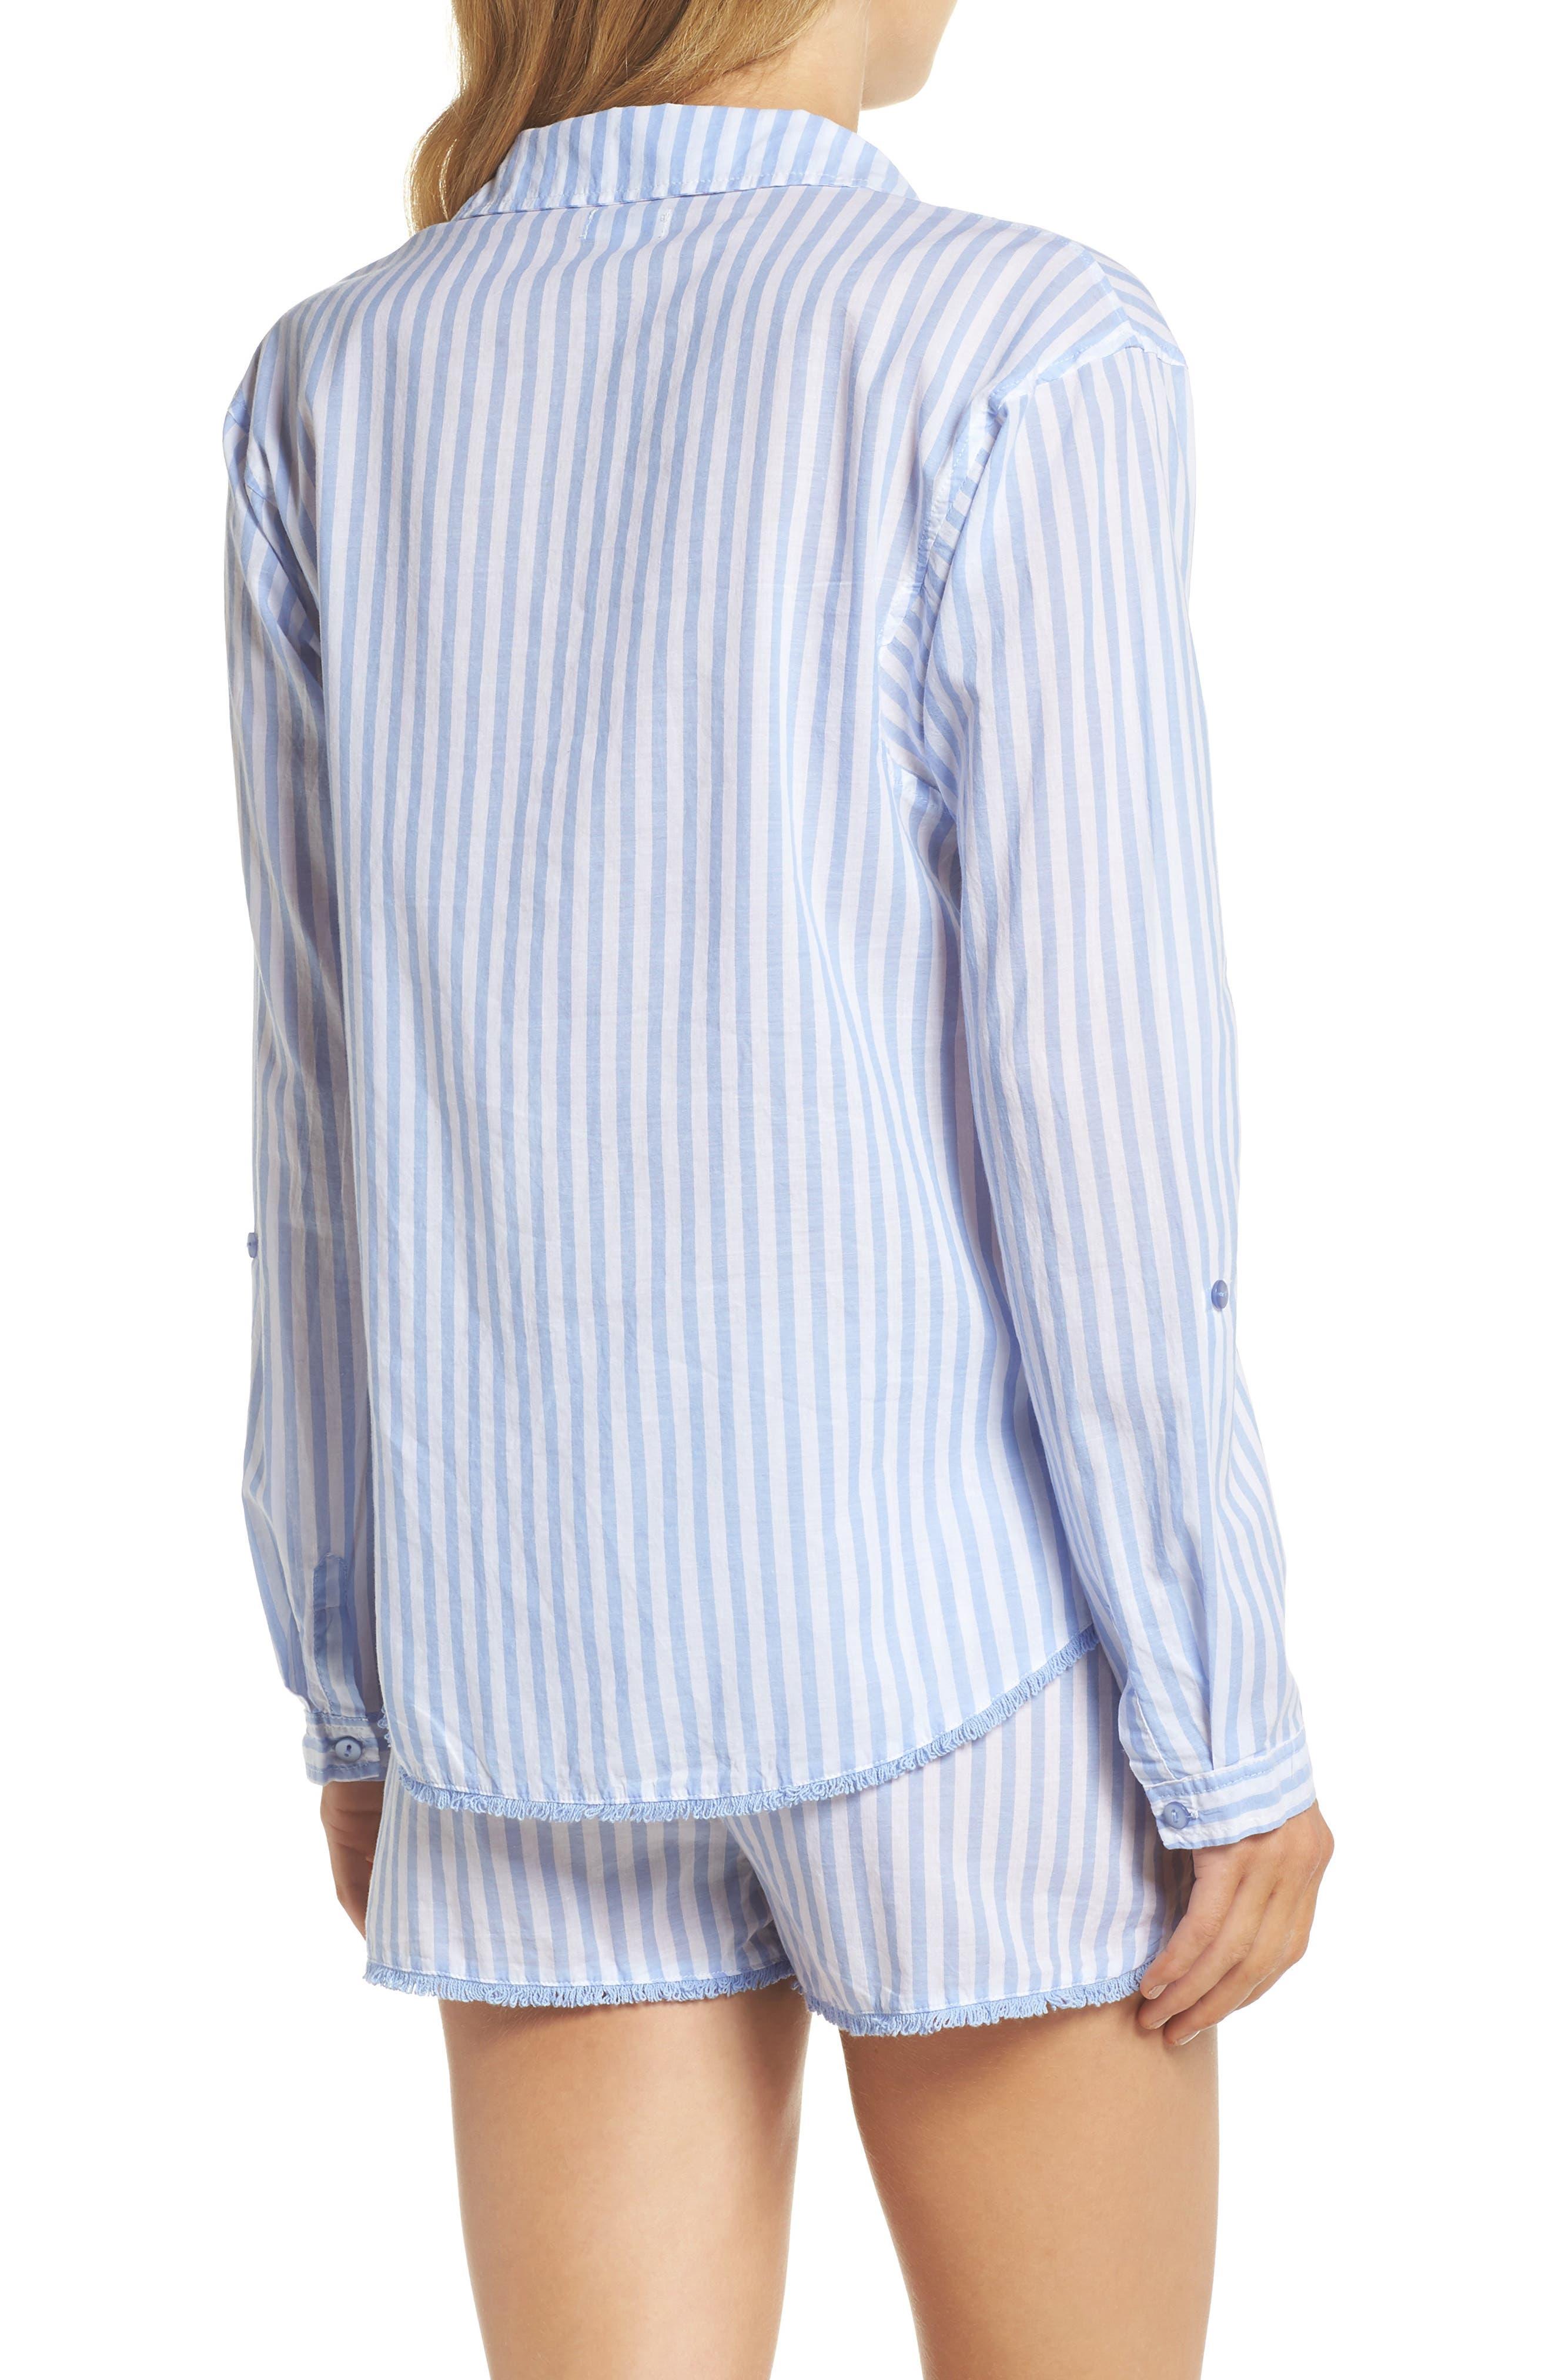 Stripe Short Pajamas,                             Alternate thumbnail 2, color,                             100